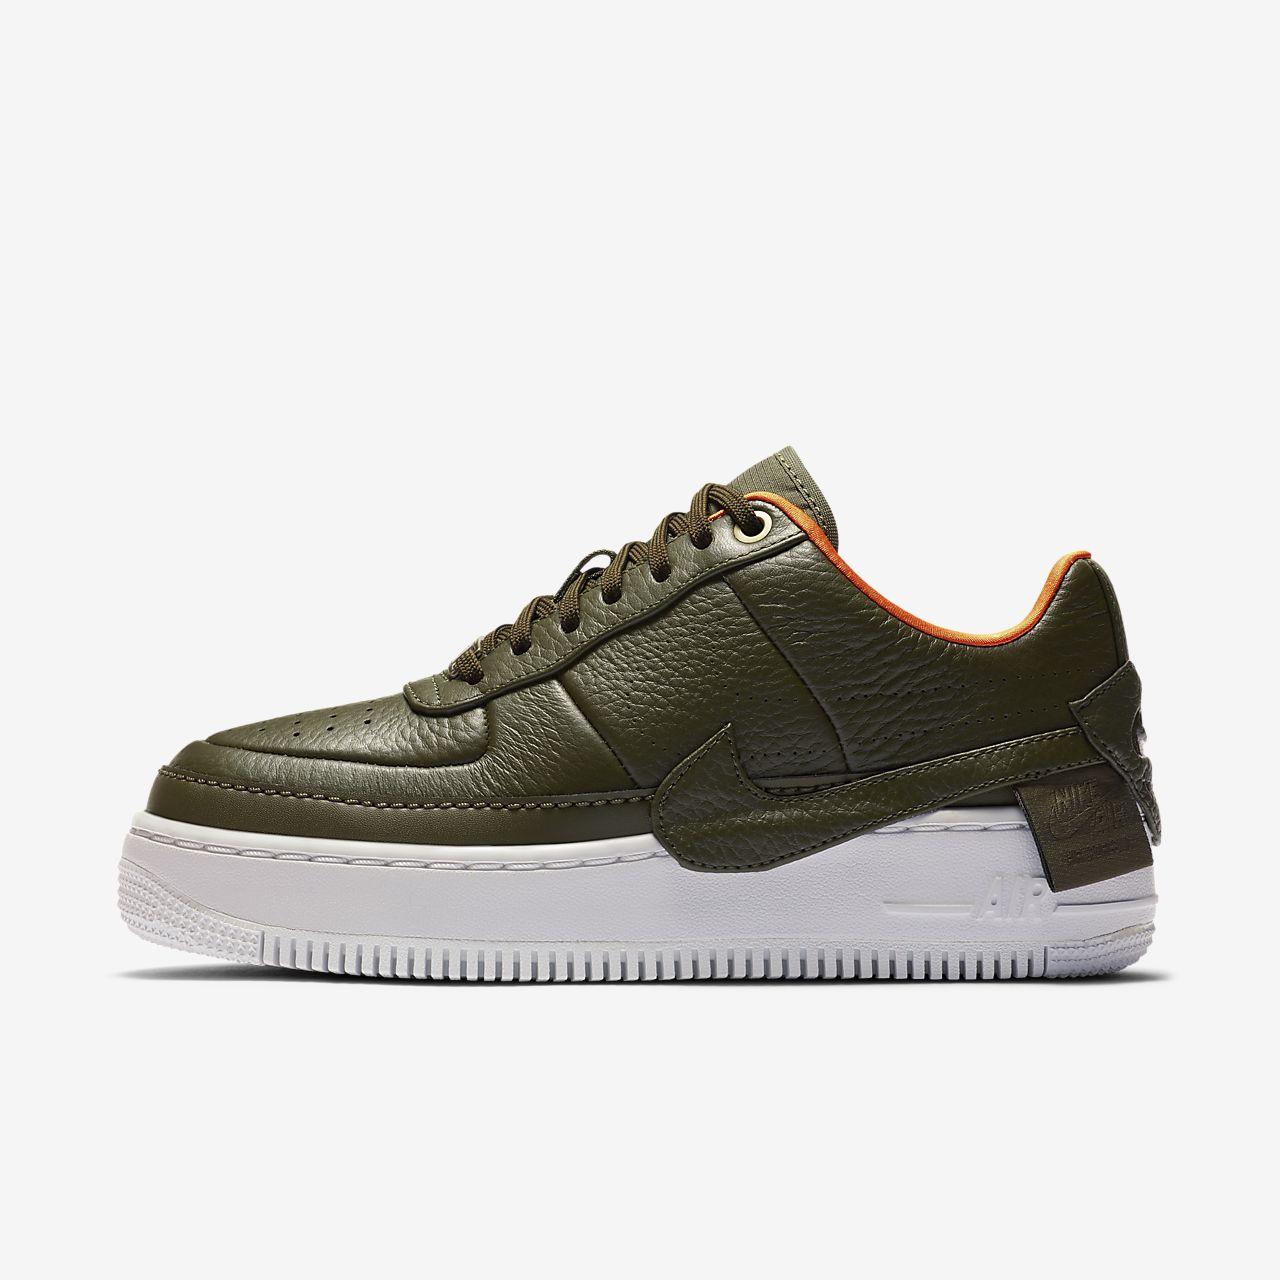 Sapatilhas Nike Air Force 1 Jester XX Premium para mulher